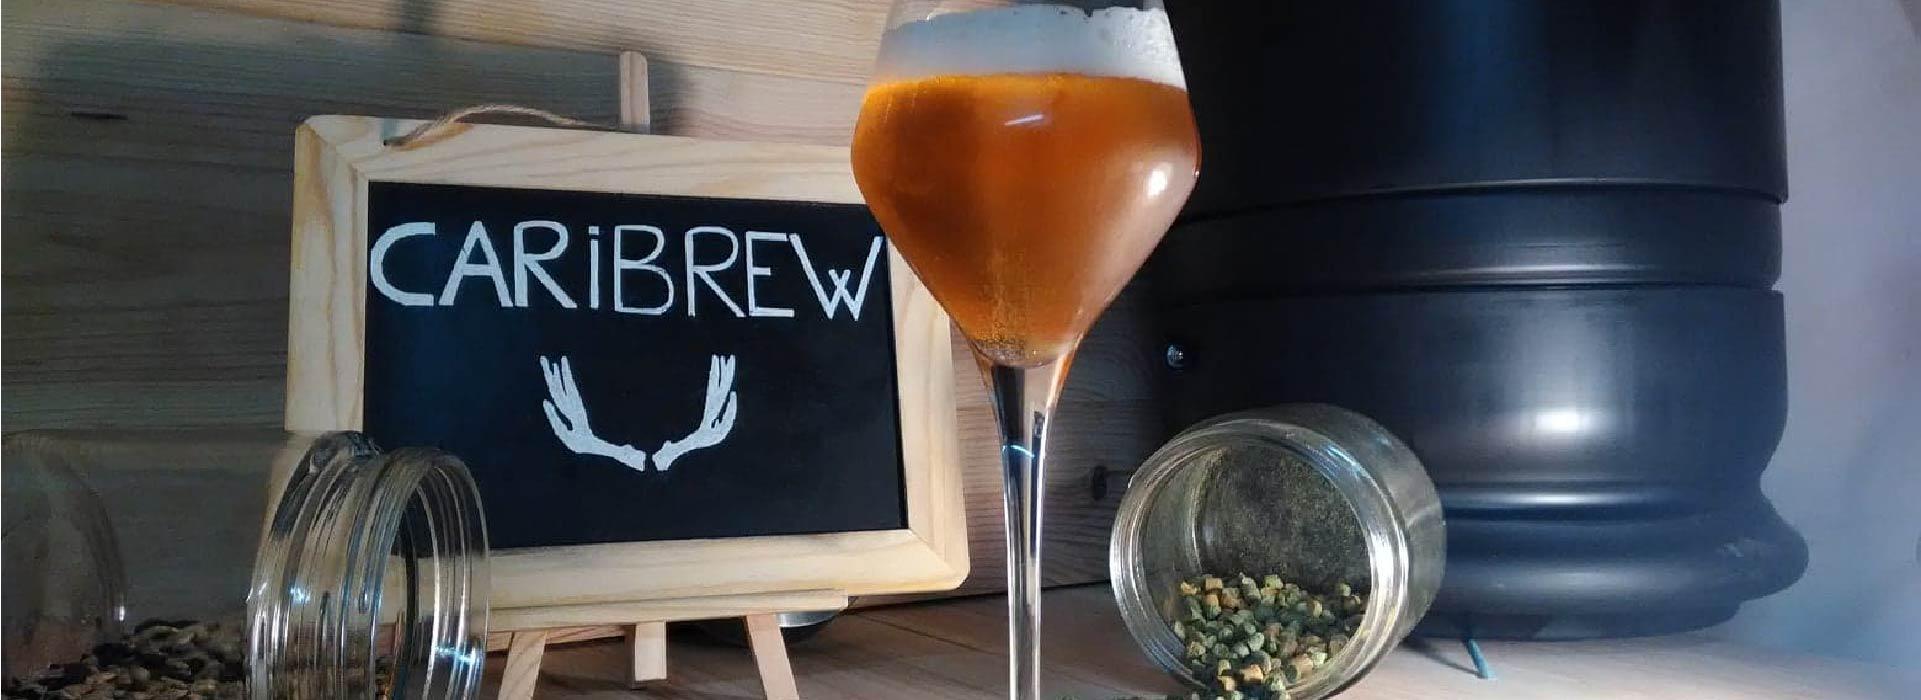 Microbrasserie-Artisanale-Bière-Lyon-Caribrew-Bières(4)